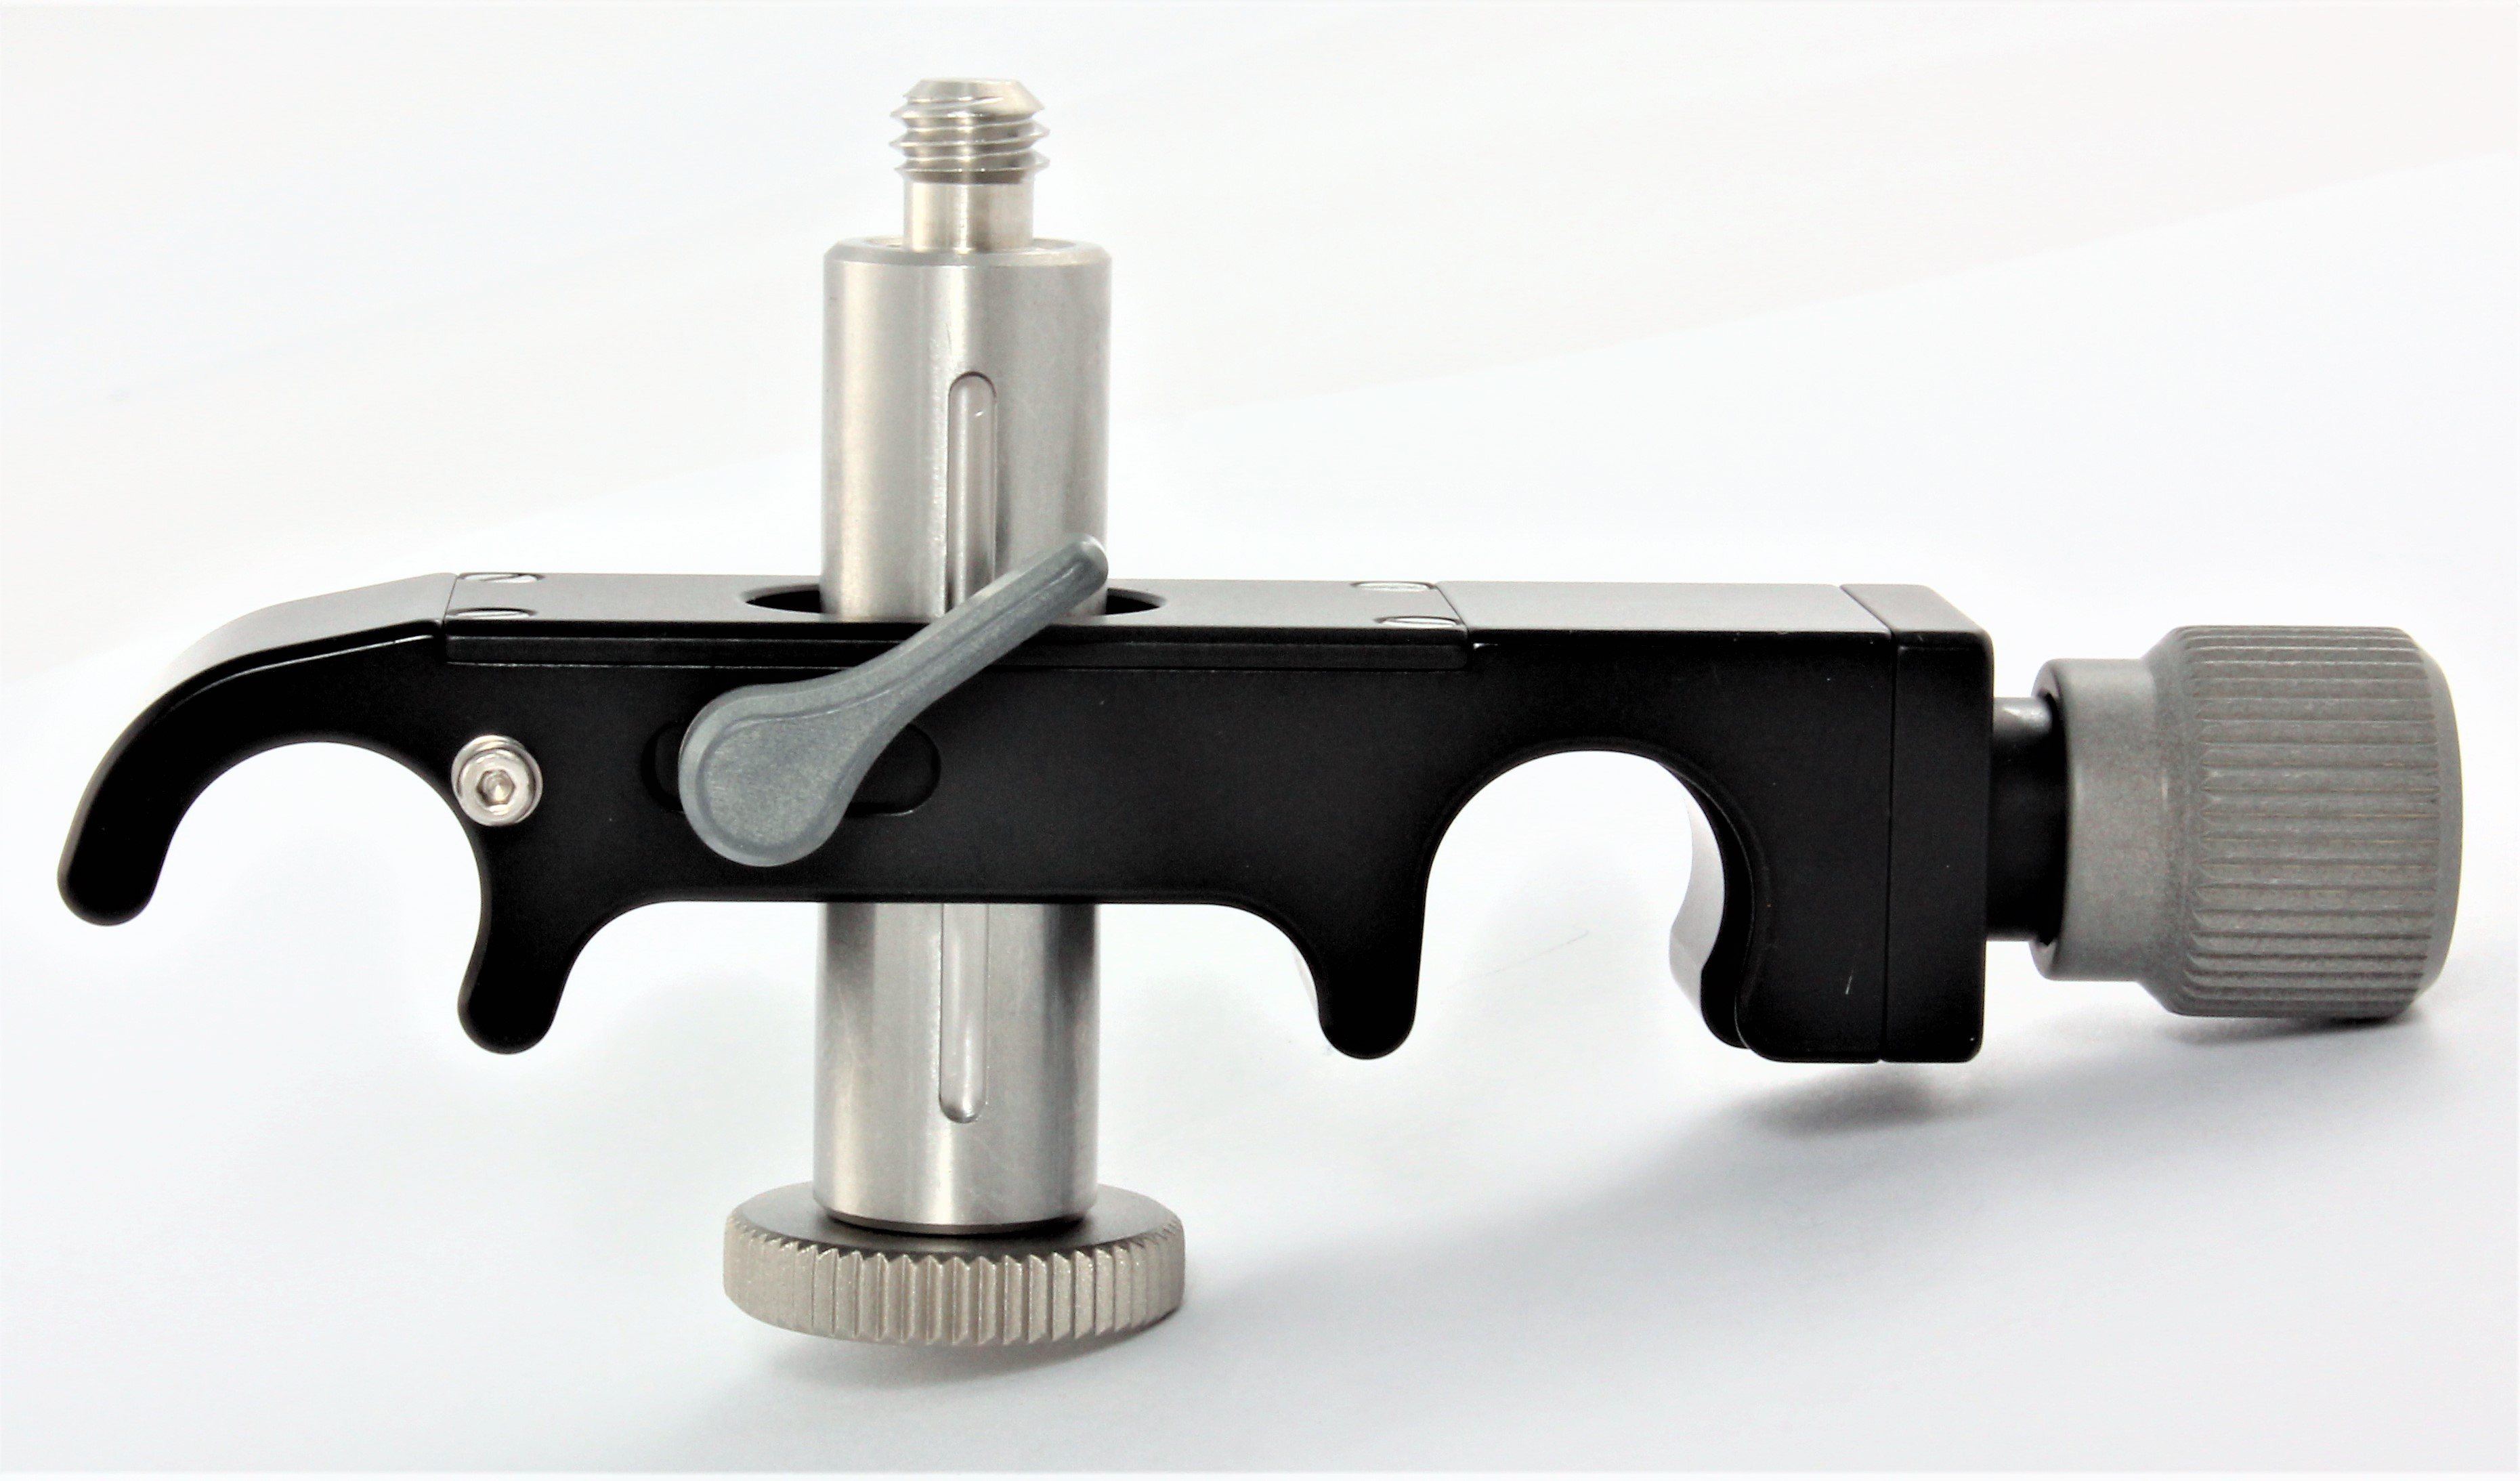 LSB-M60-312 Image